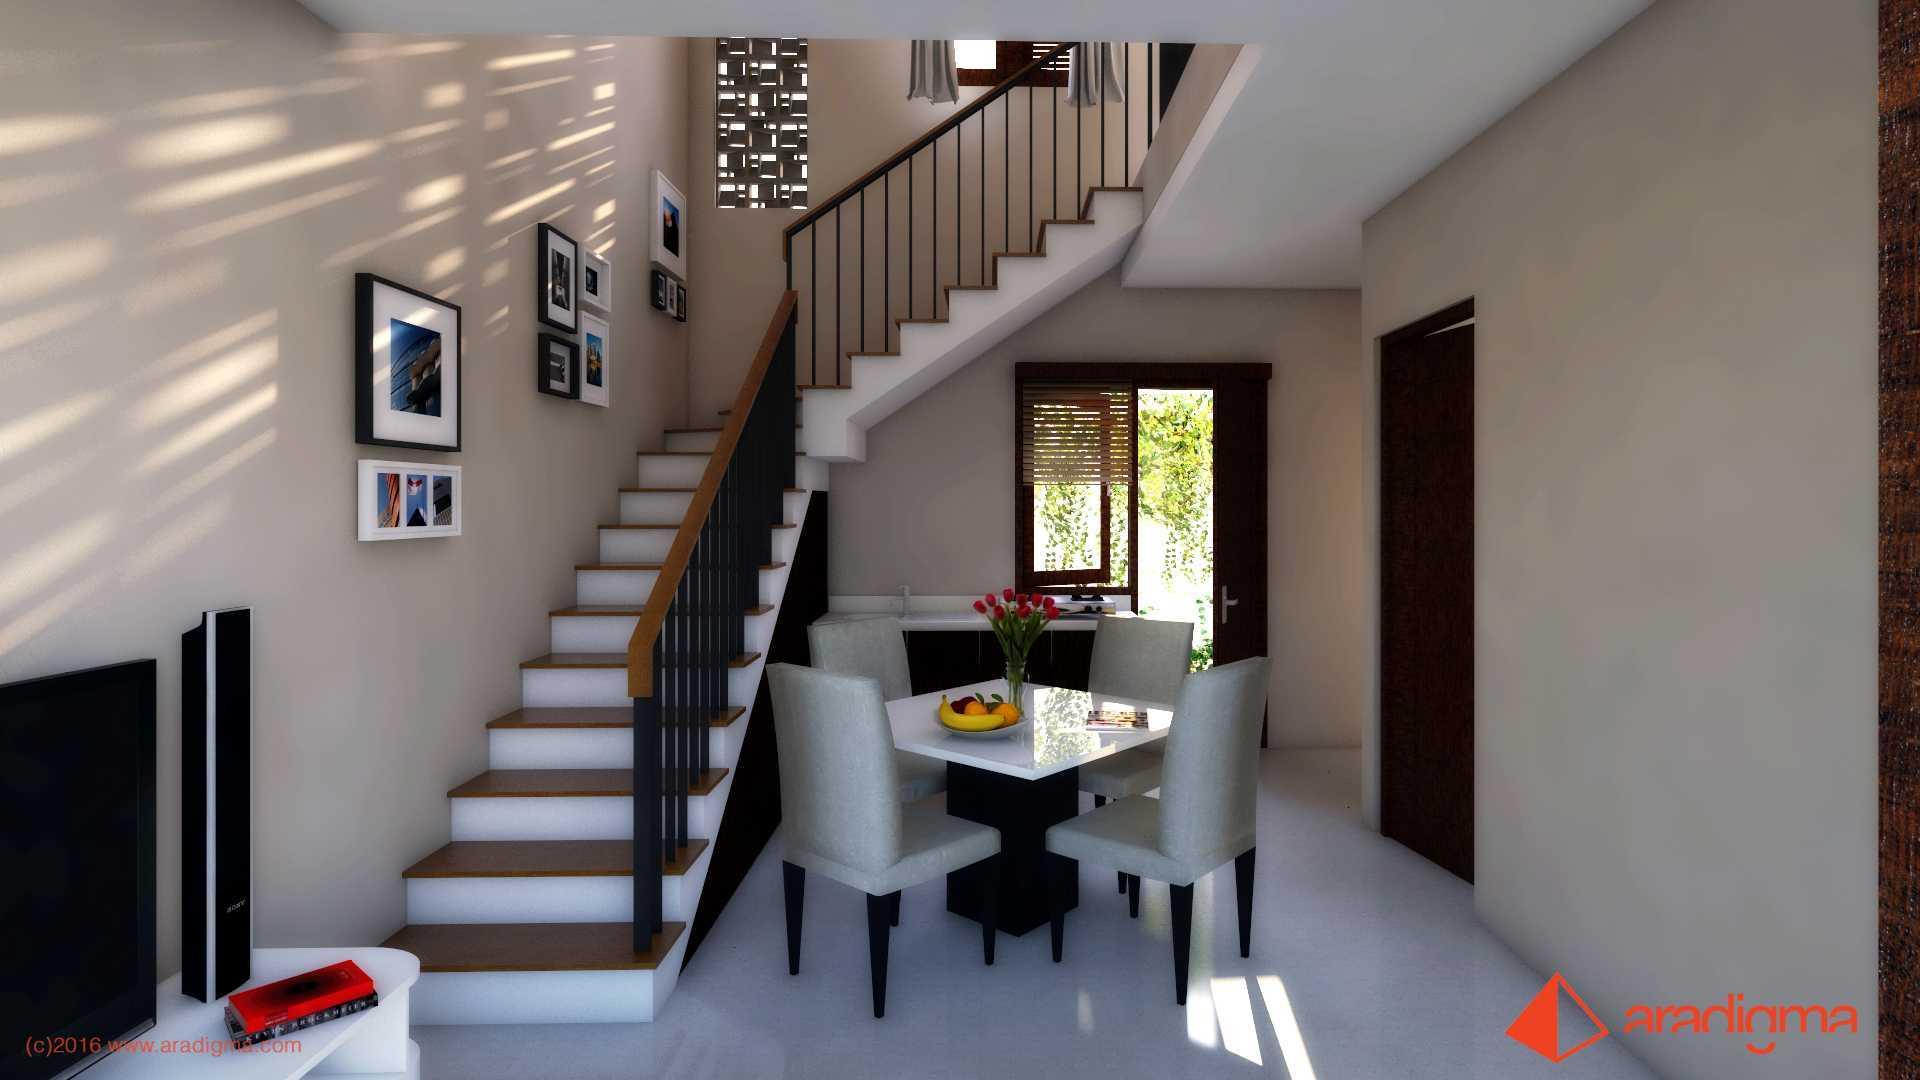 Aradigma Rumah Arjuna Malang Malang Stairs And Diningroom Modern  18747